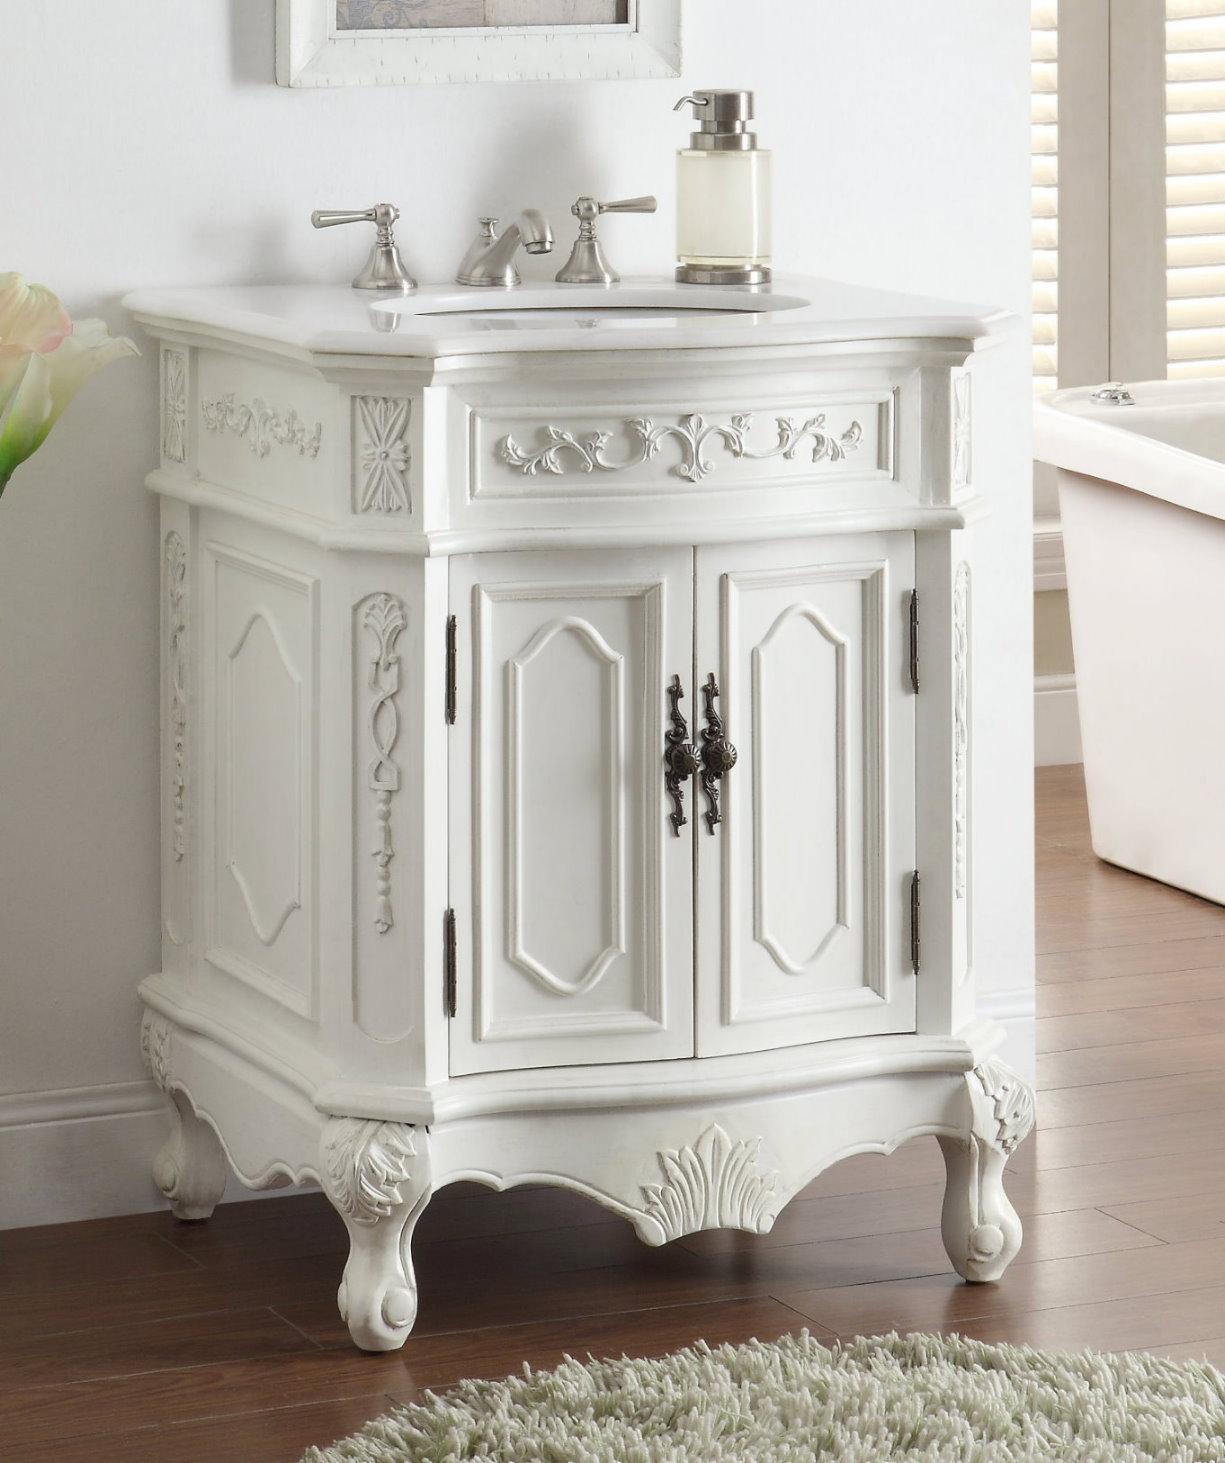 27 inch Adelina White Finish Antique Bathroom Vanity